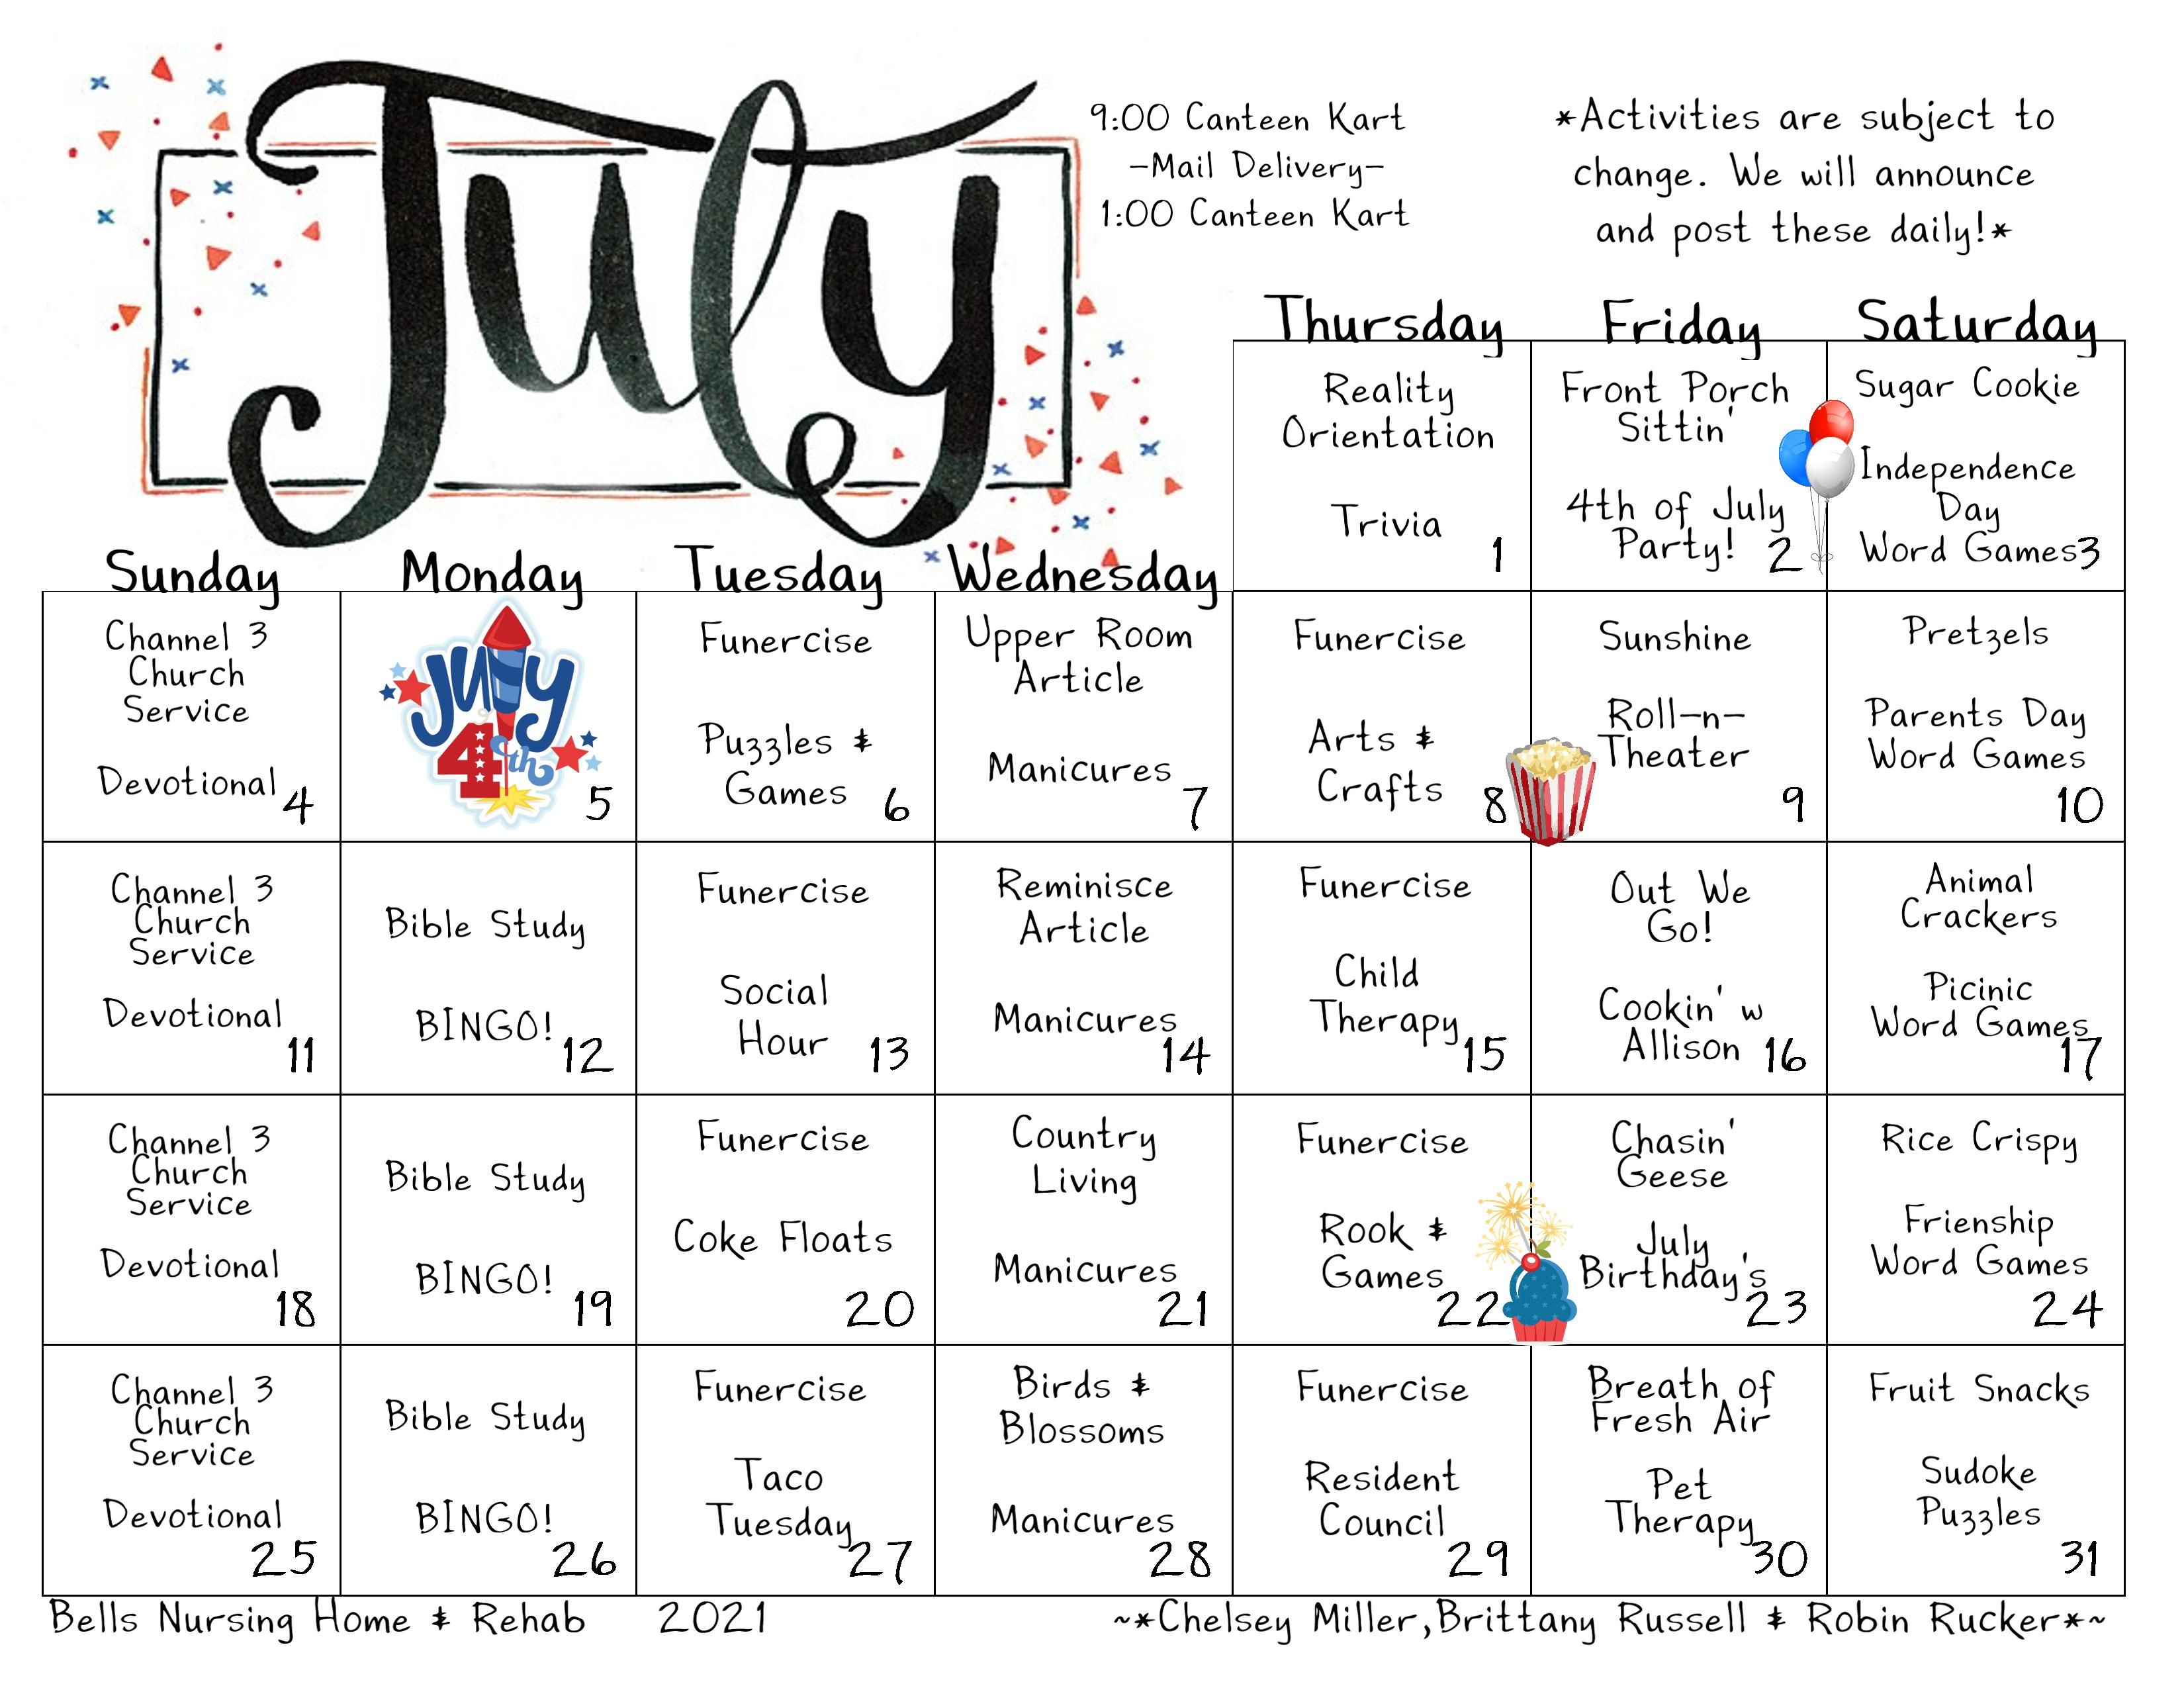 Bells Nursing and Rehabilitation Center Calendar